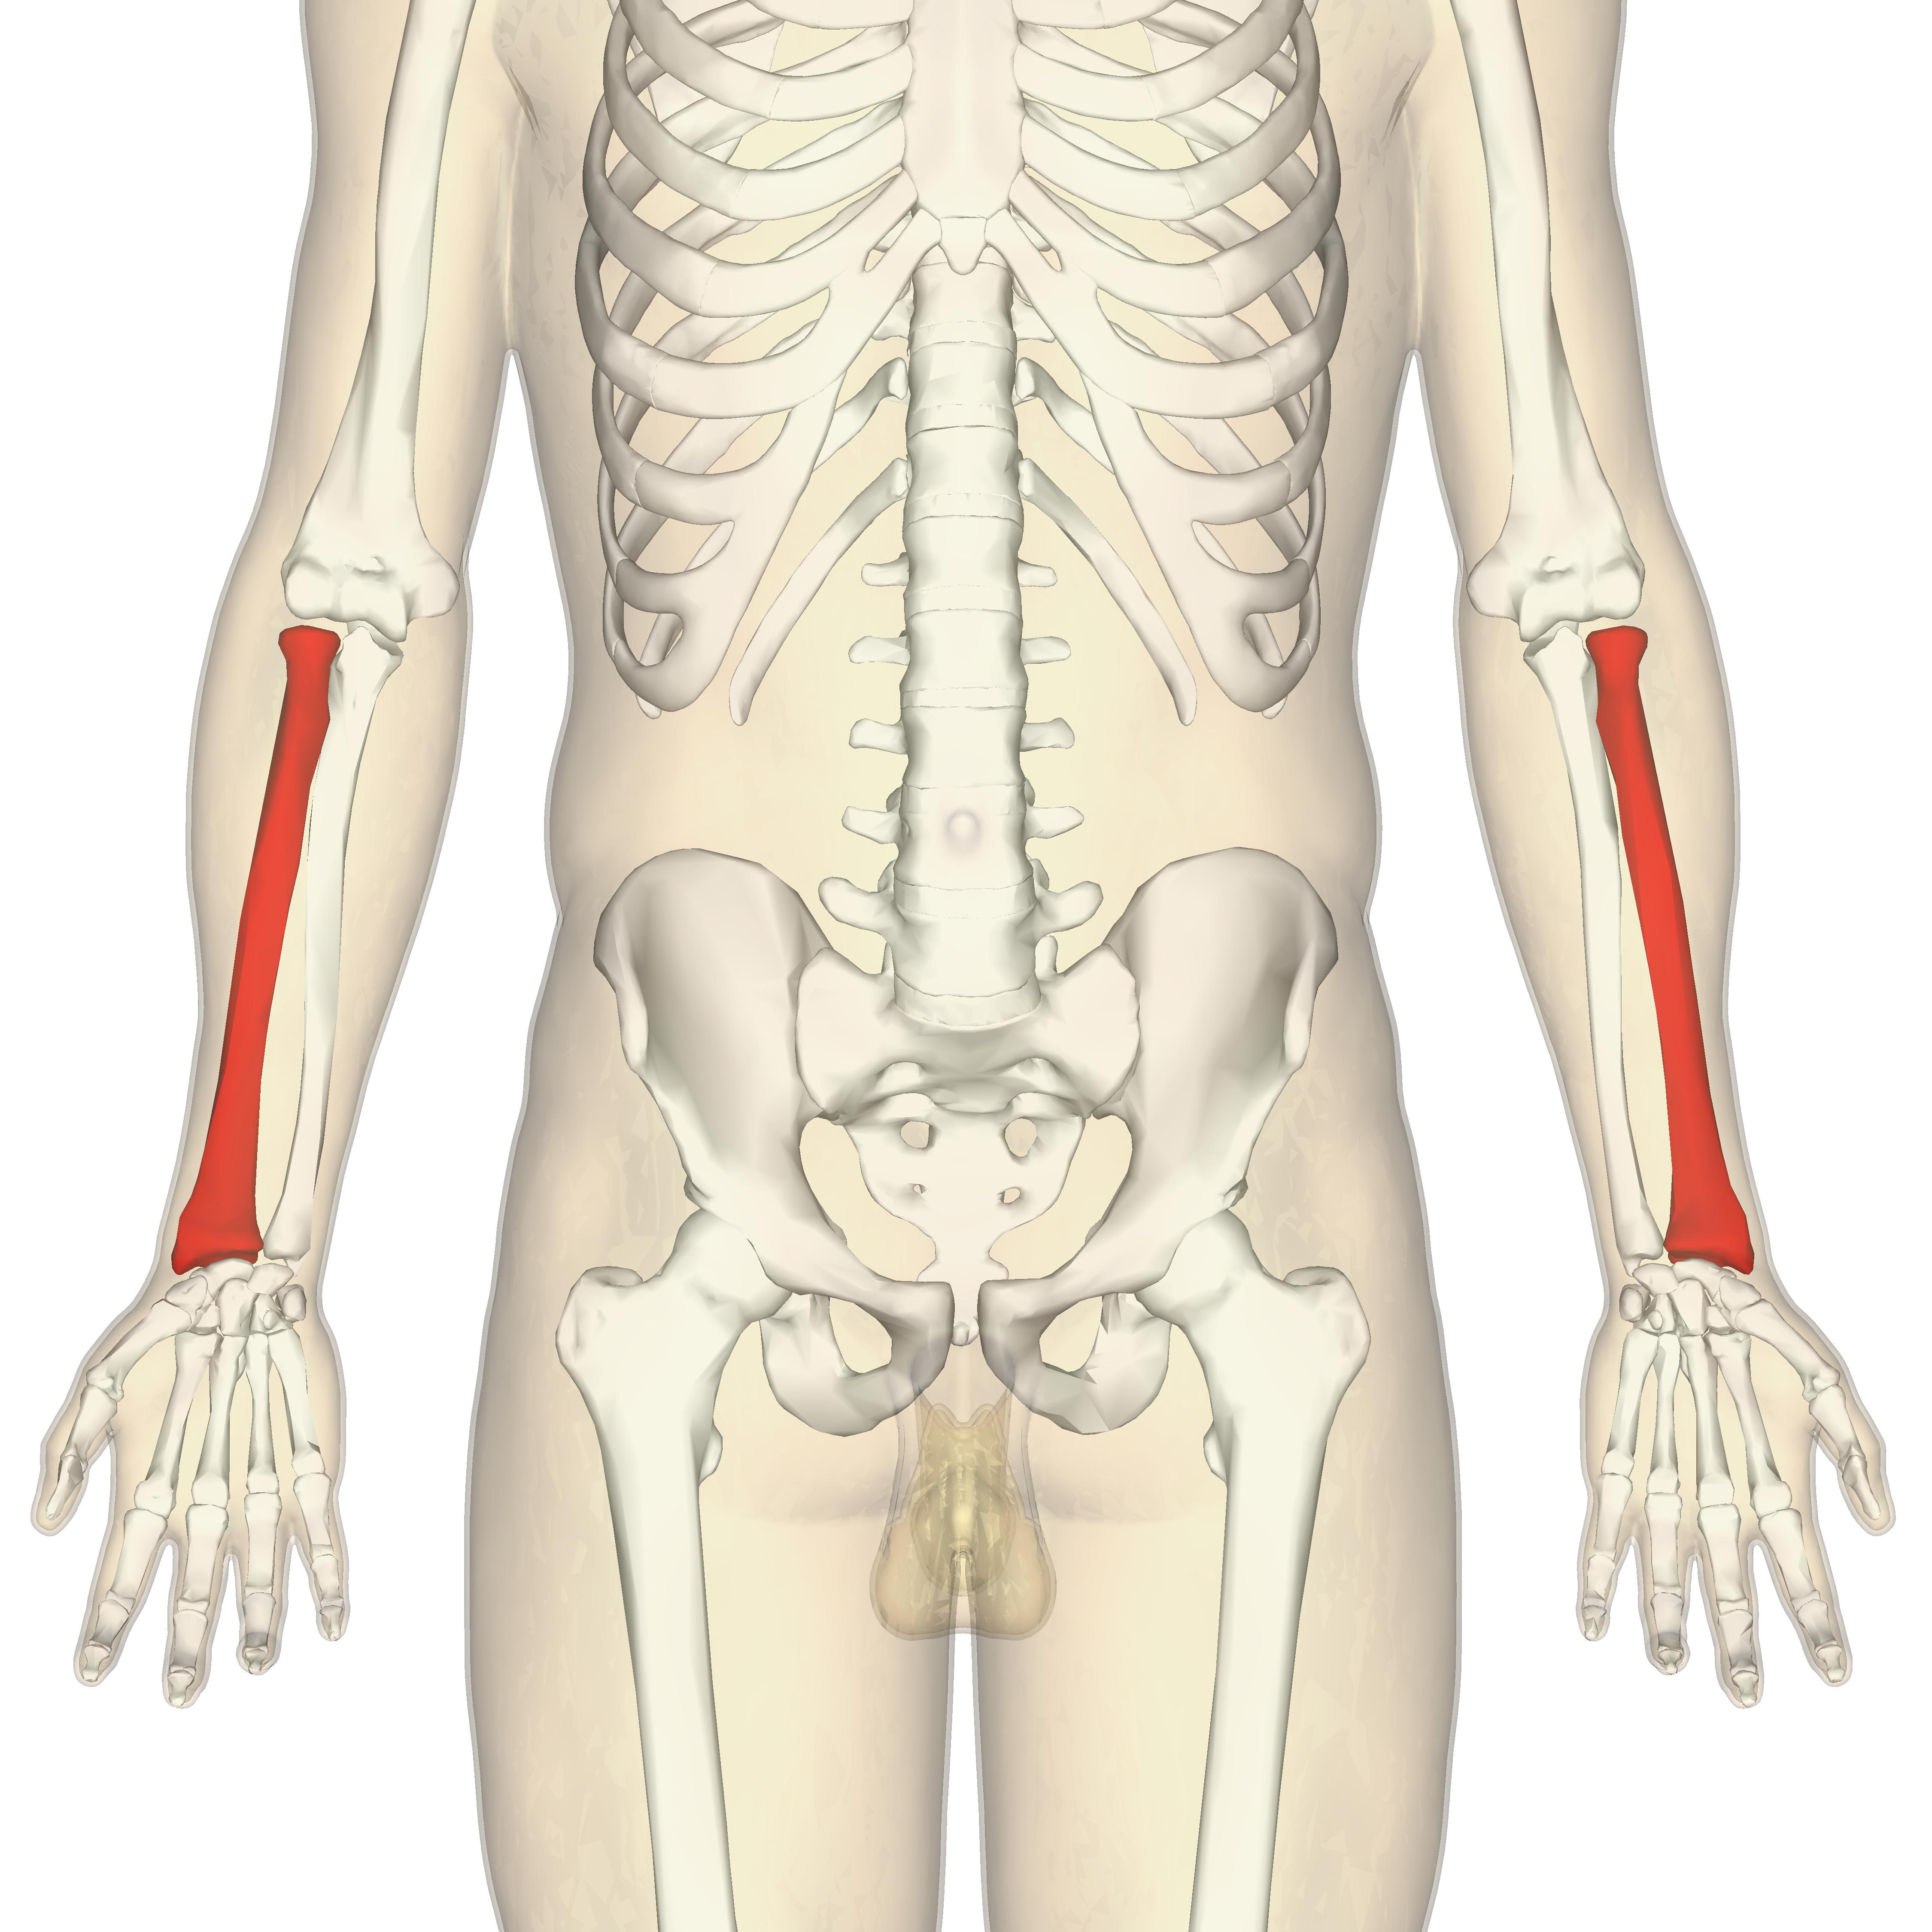 Radius (bone) - Wikiwand